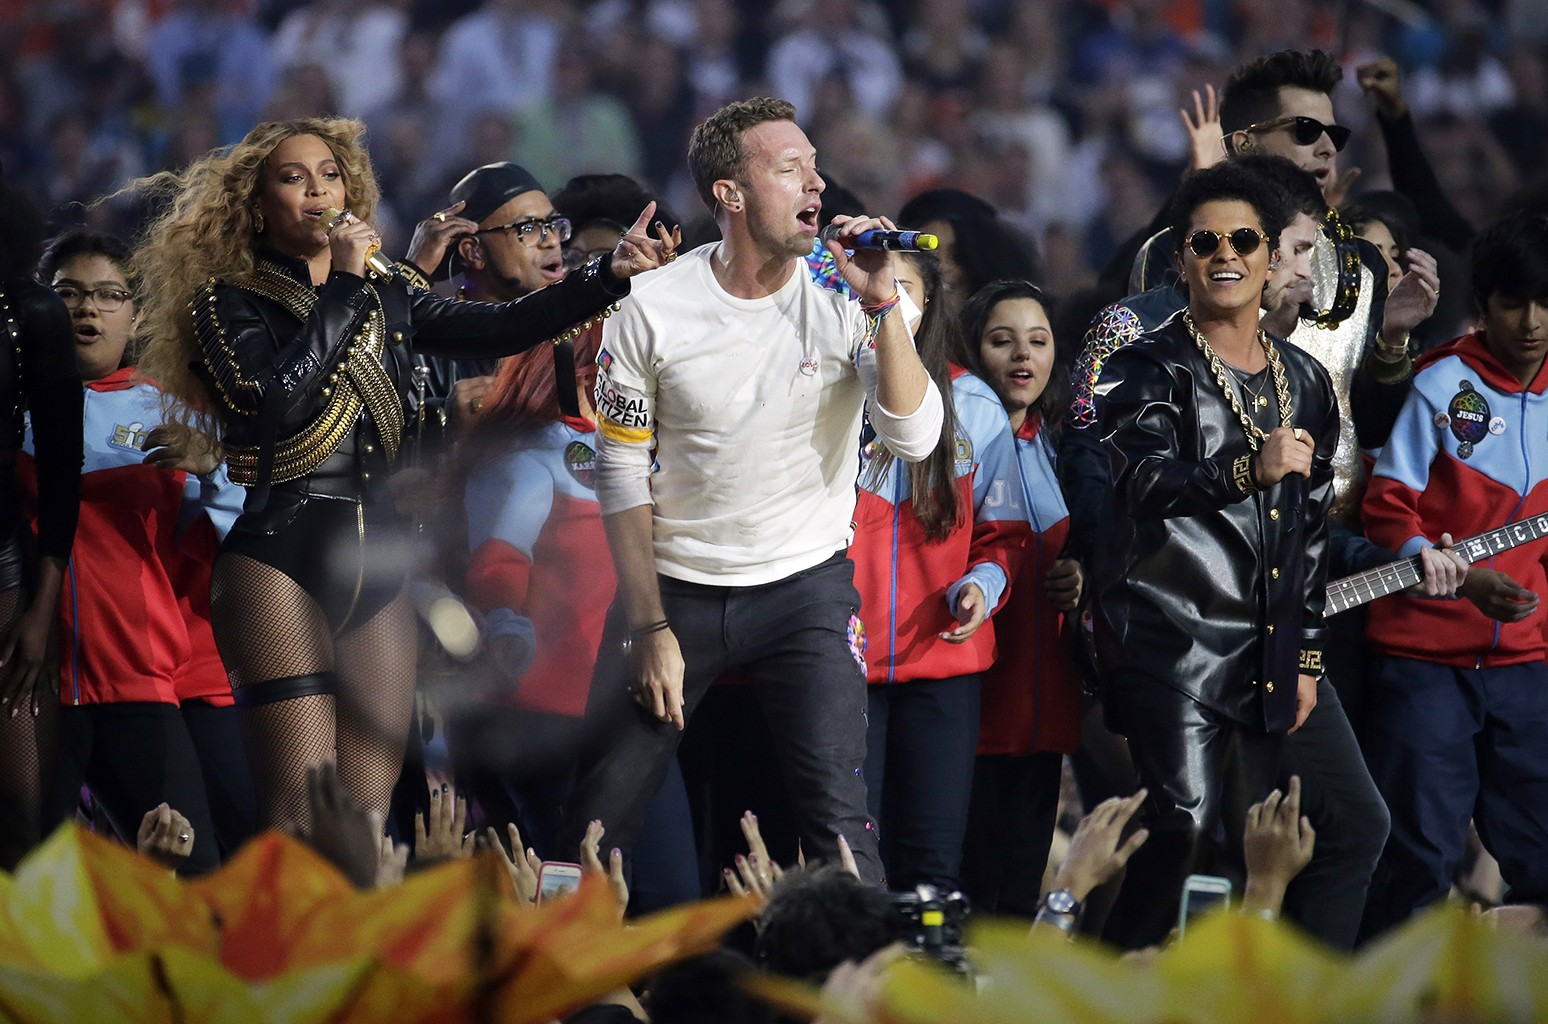 Beyoncé, Chris Martin and Bruno Mars perform during halftime of the NFL Super Bowl